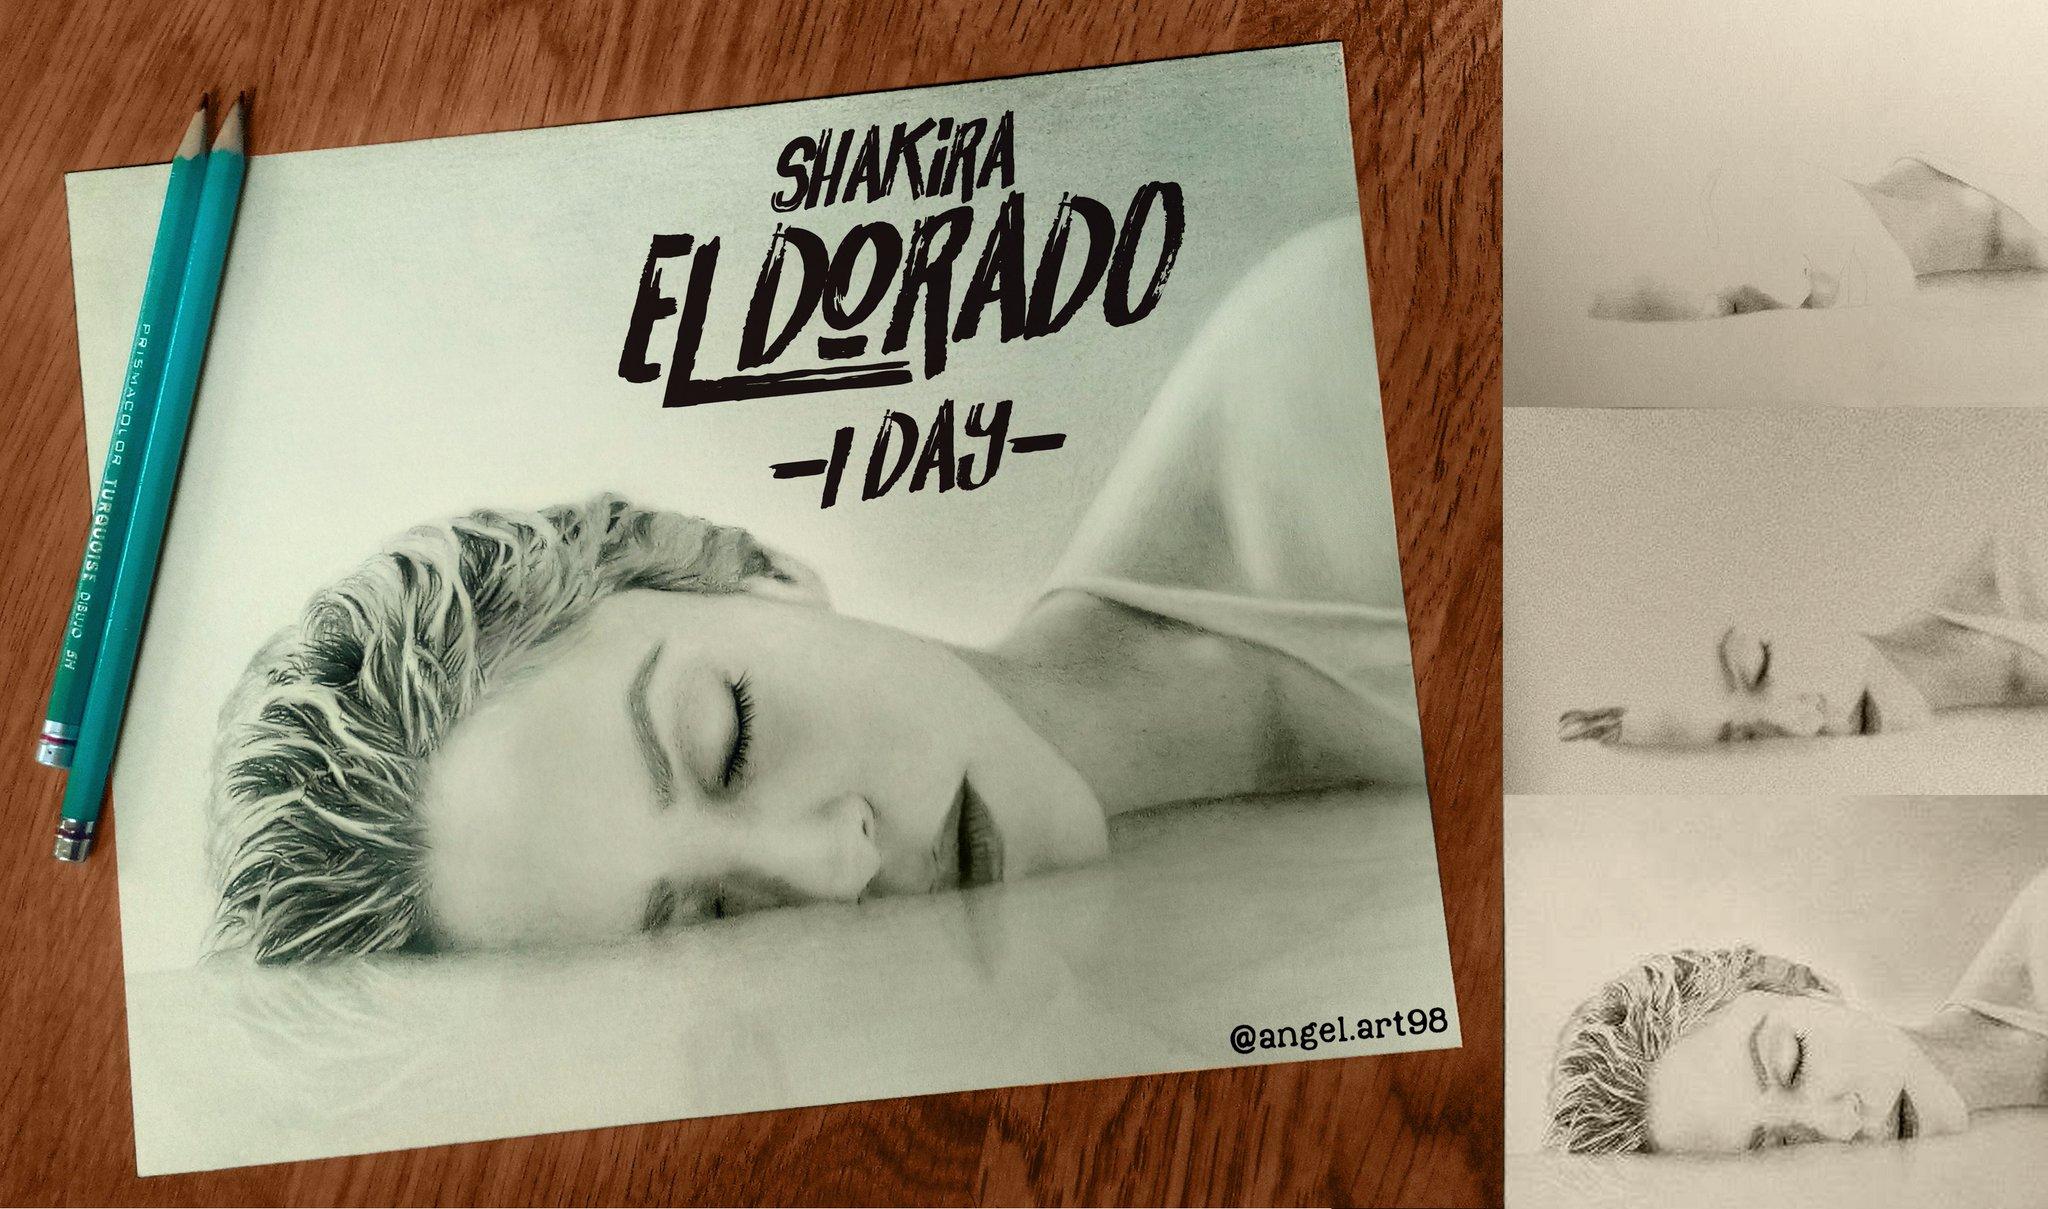 TOMORROW! / MAÑANA! #ElDoradoCountdown ShakHQ  ✏️ @angel_art98 #ElDorado https://t.co/T5LOT7DrxG